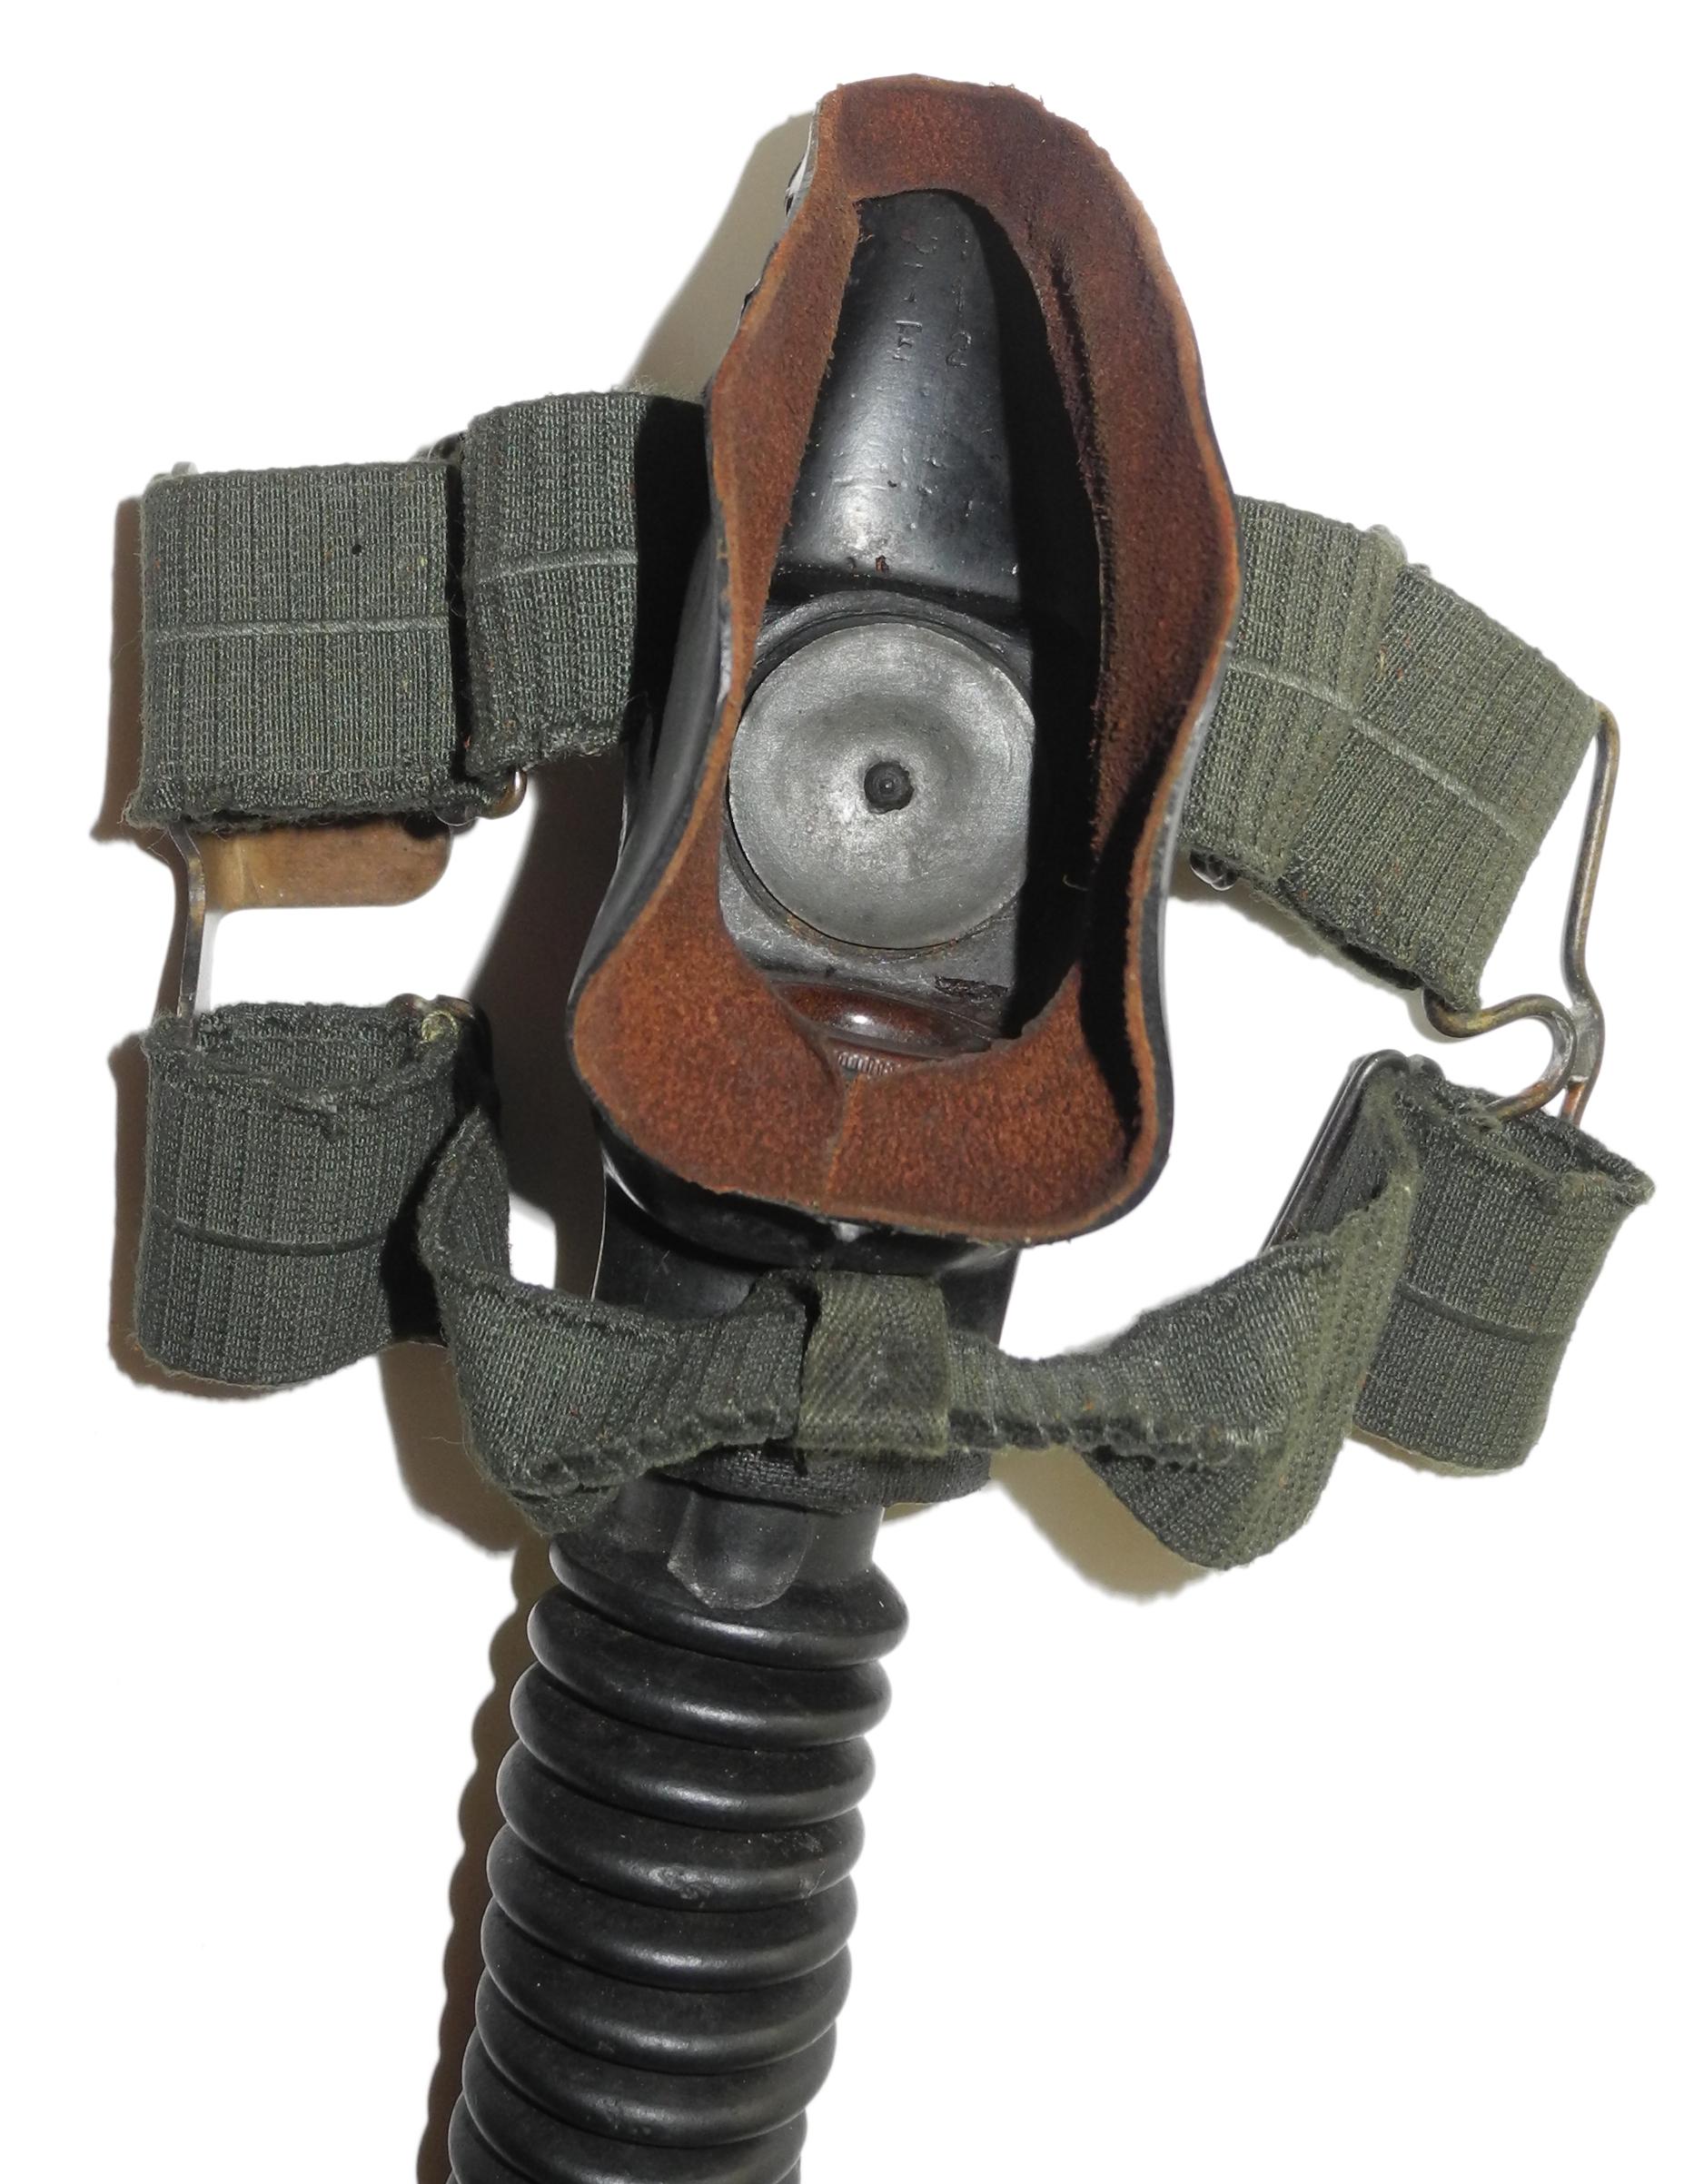 LW 6701 double-strap oxygen mask